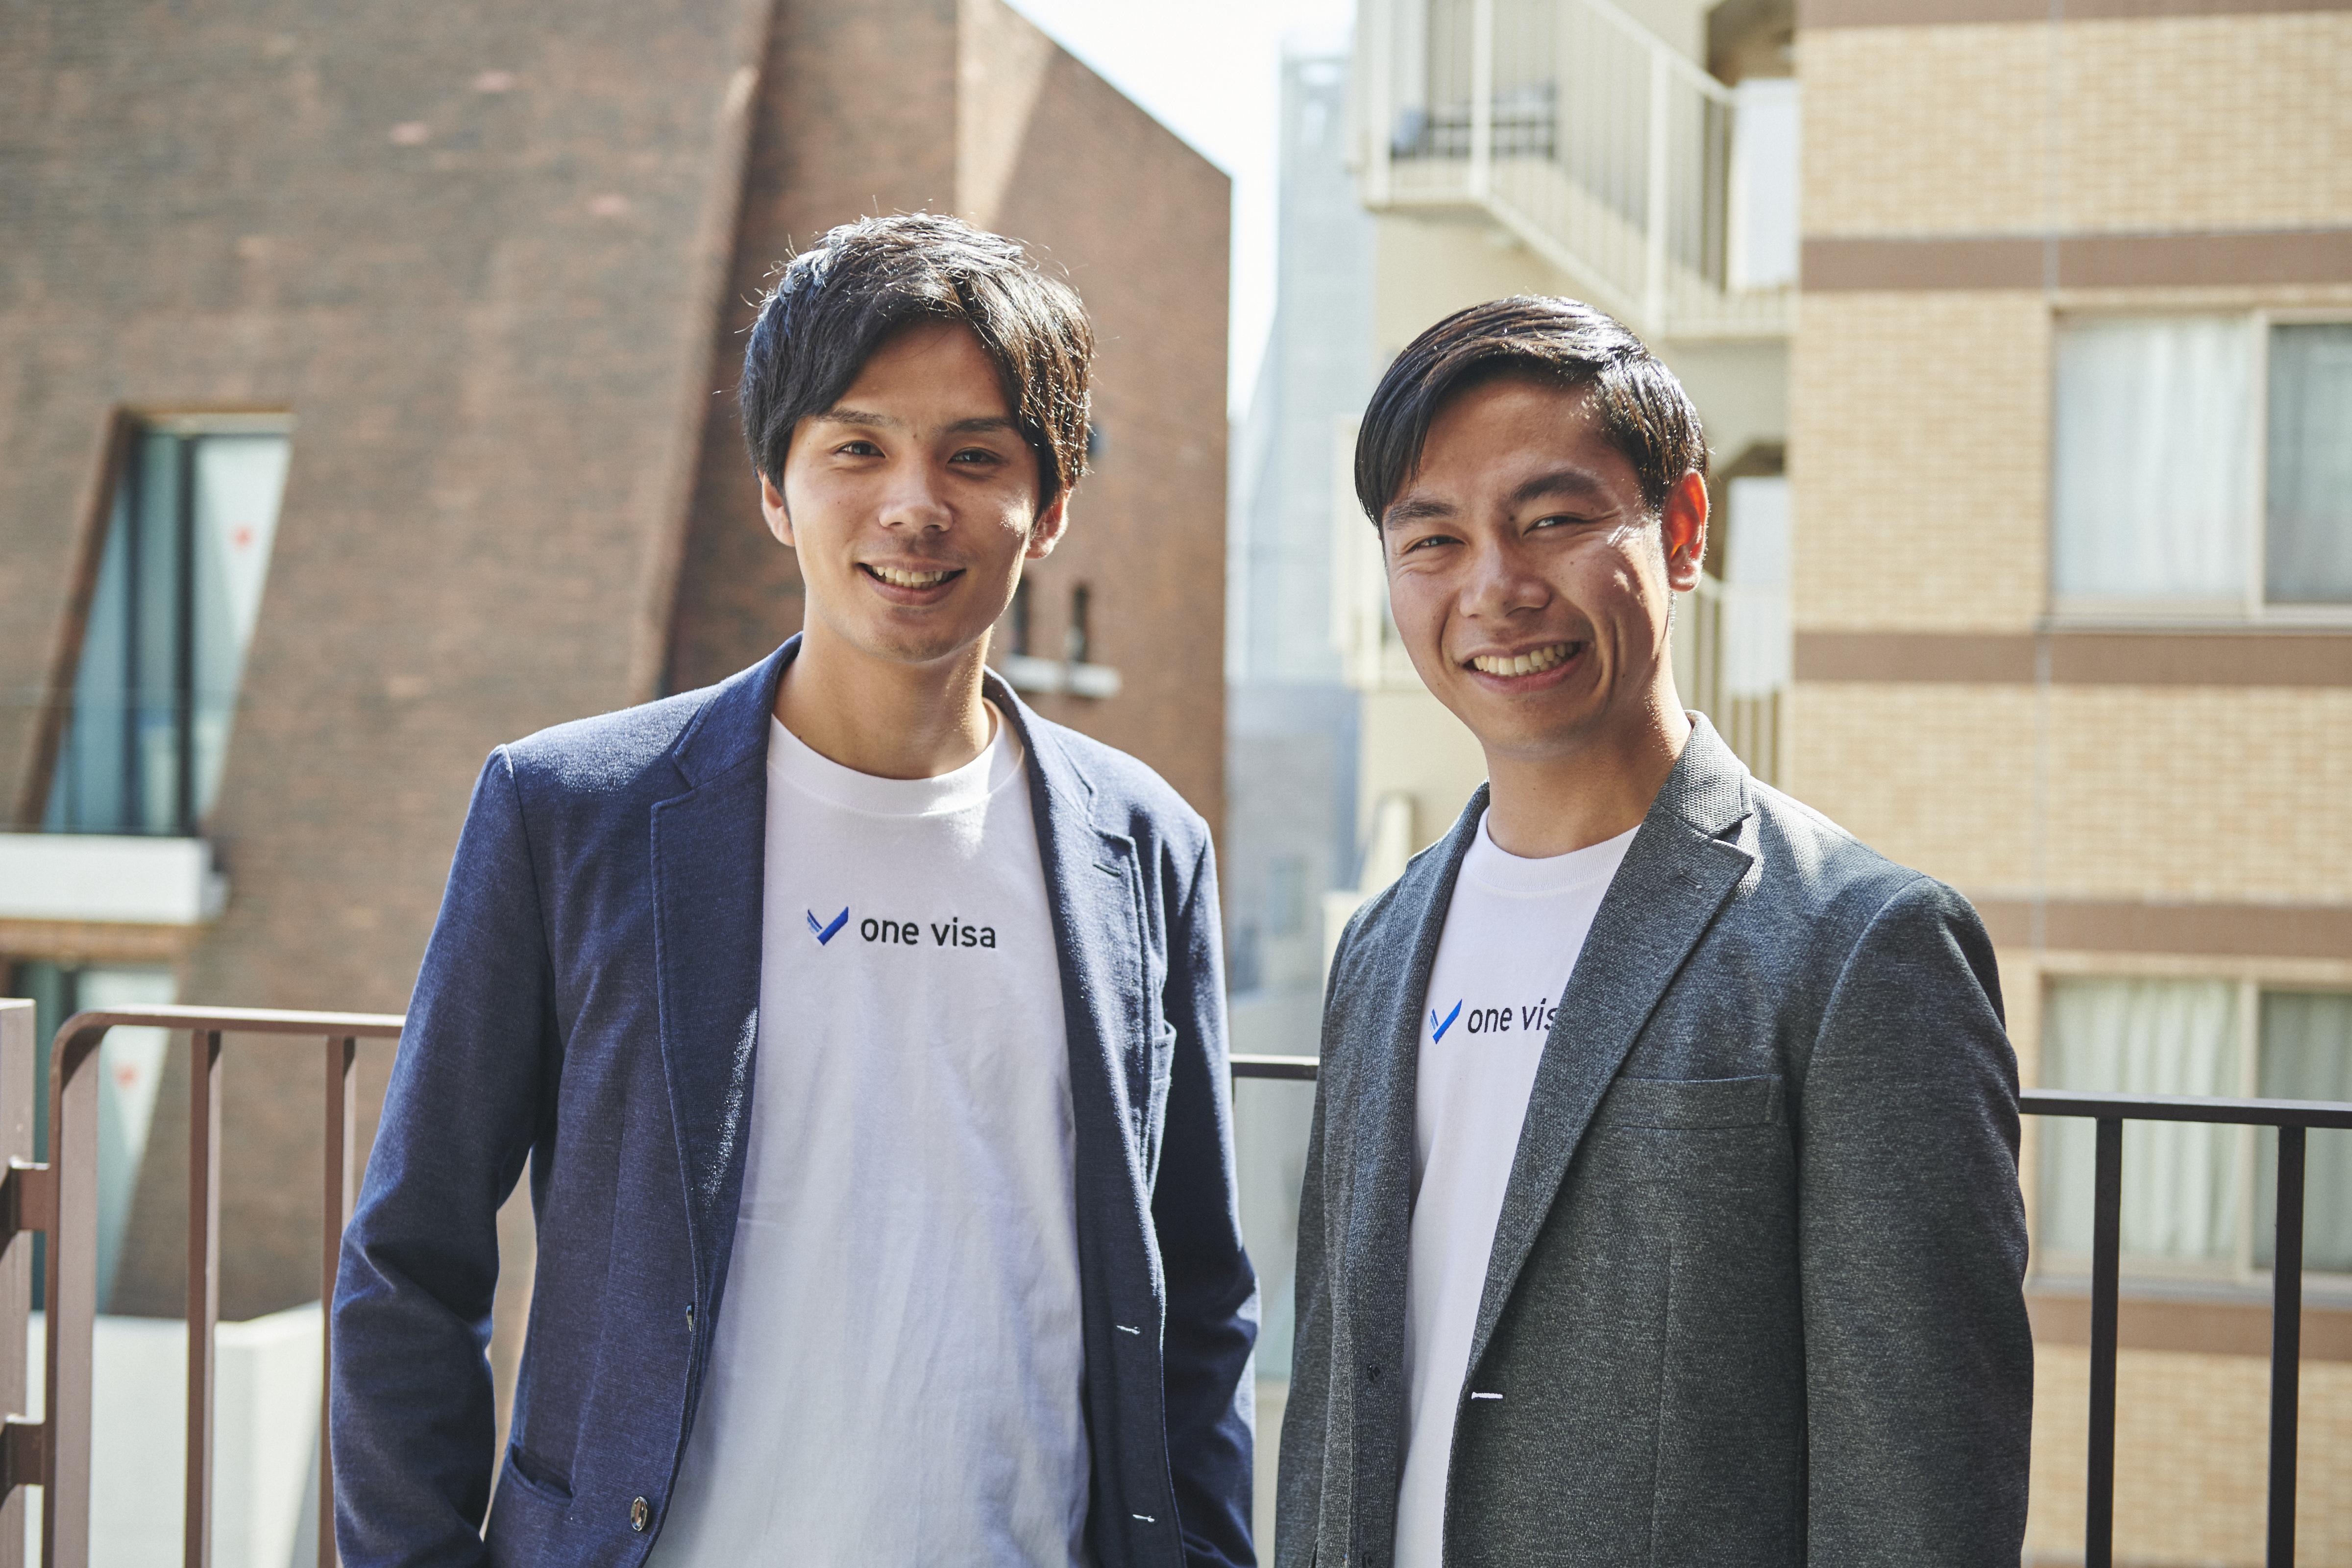 【HubSpot導入事例】切実な課題を抱える読み手のためにコンテンツを作る。新卒社員が1年半でPVを154倍に成長させた、株式会社one visaのオウンドメディア施策